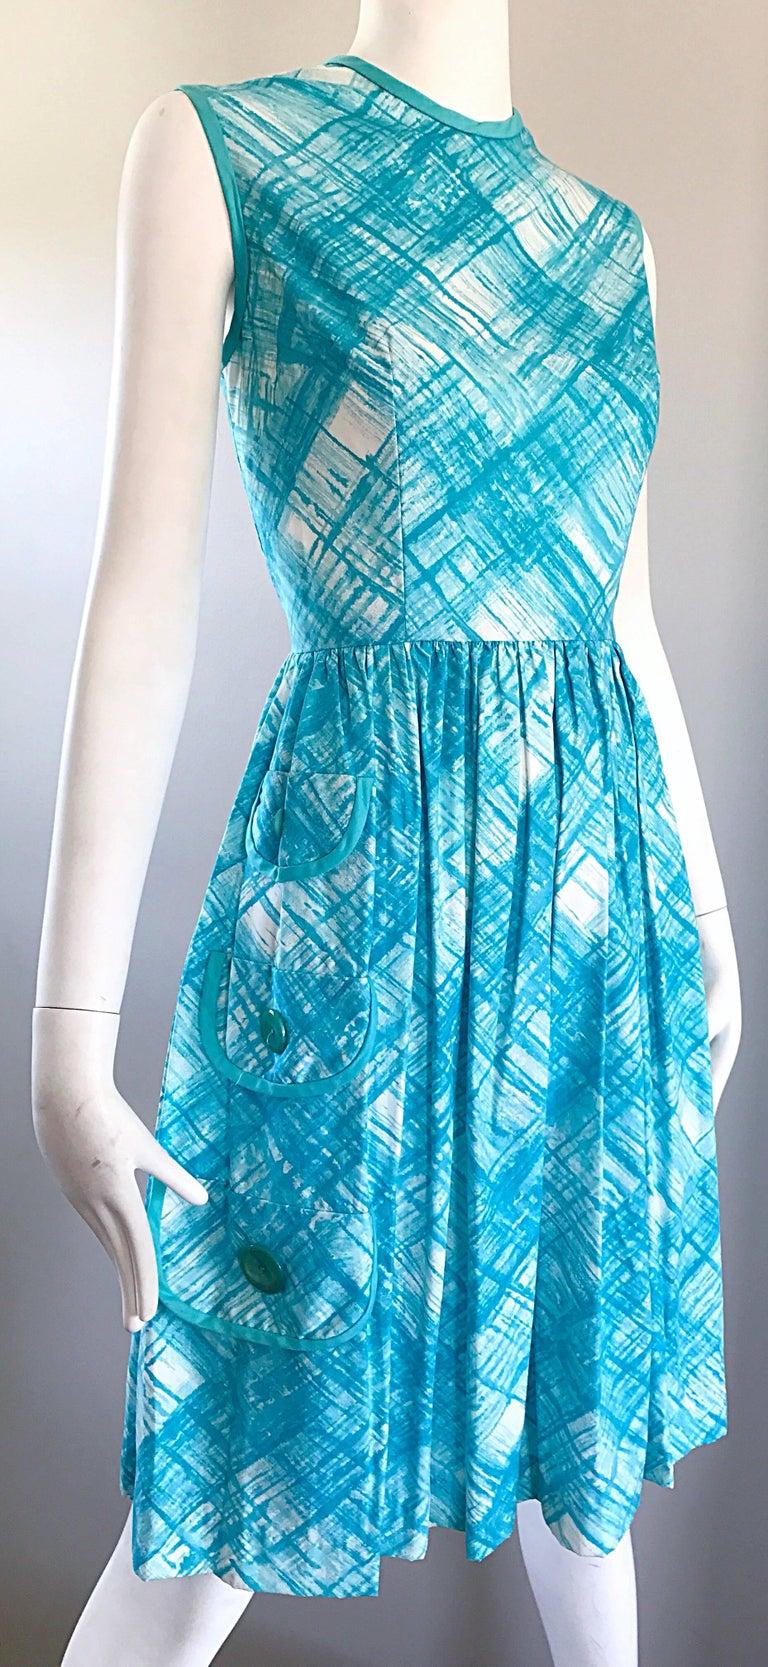 1950s Turquoise Blue And White Diagonal Plaid Cotton